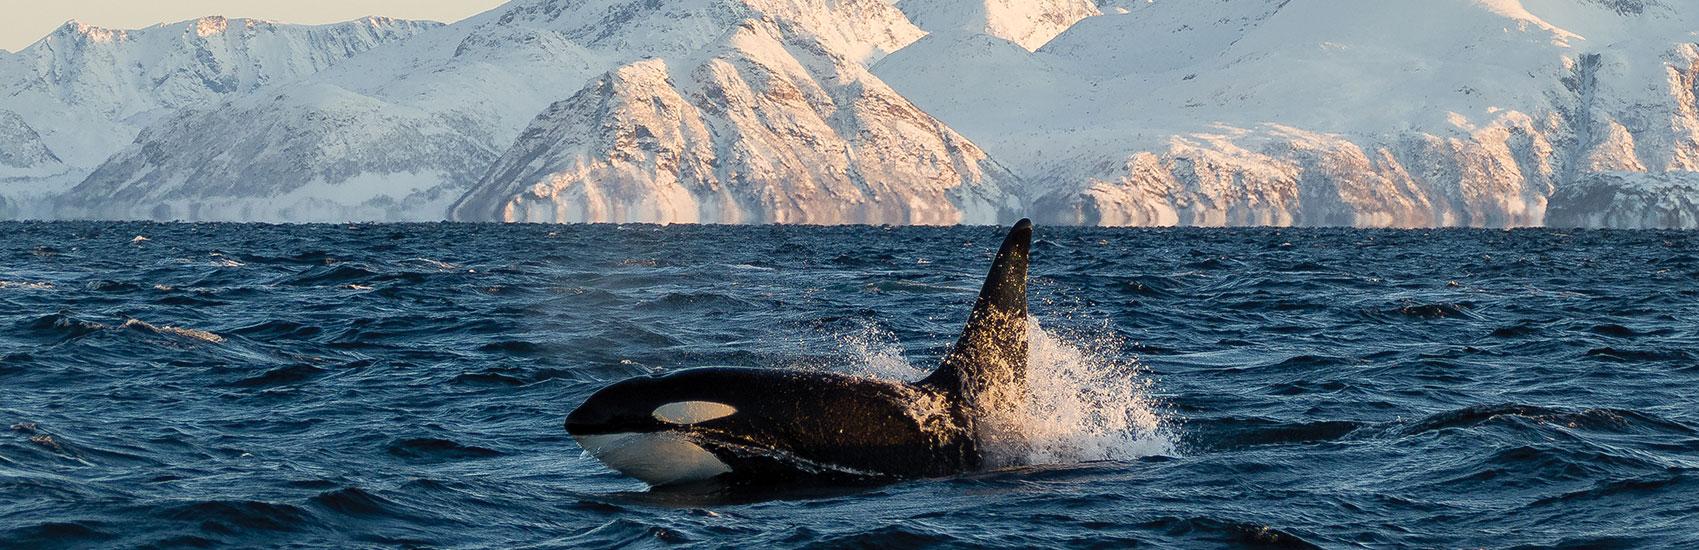 Holland America: Alaska's Top 5 Marine Mammals 3